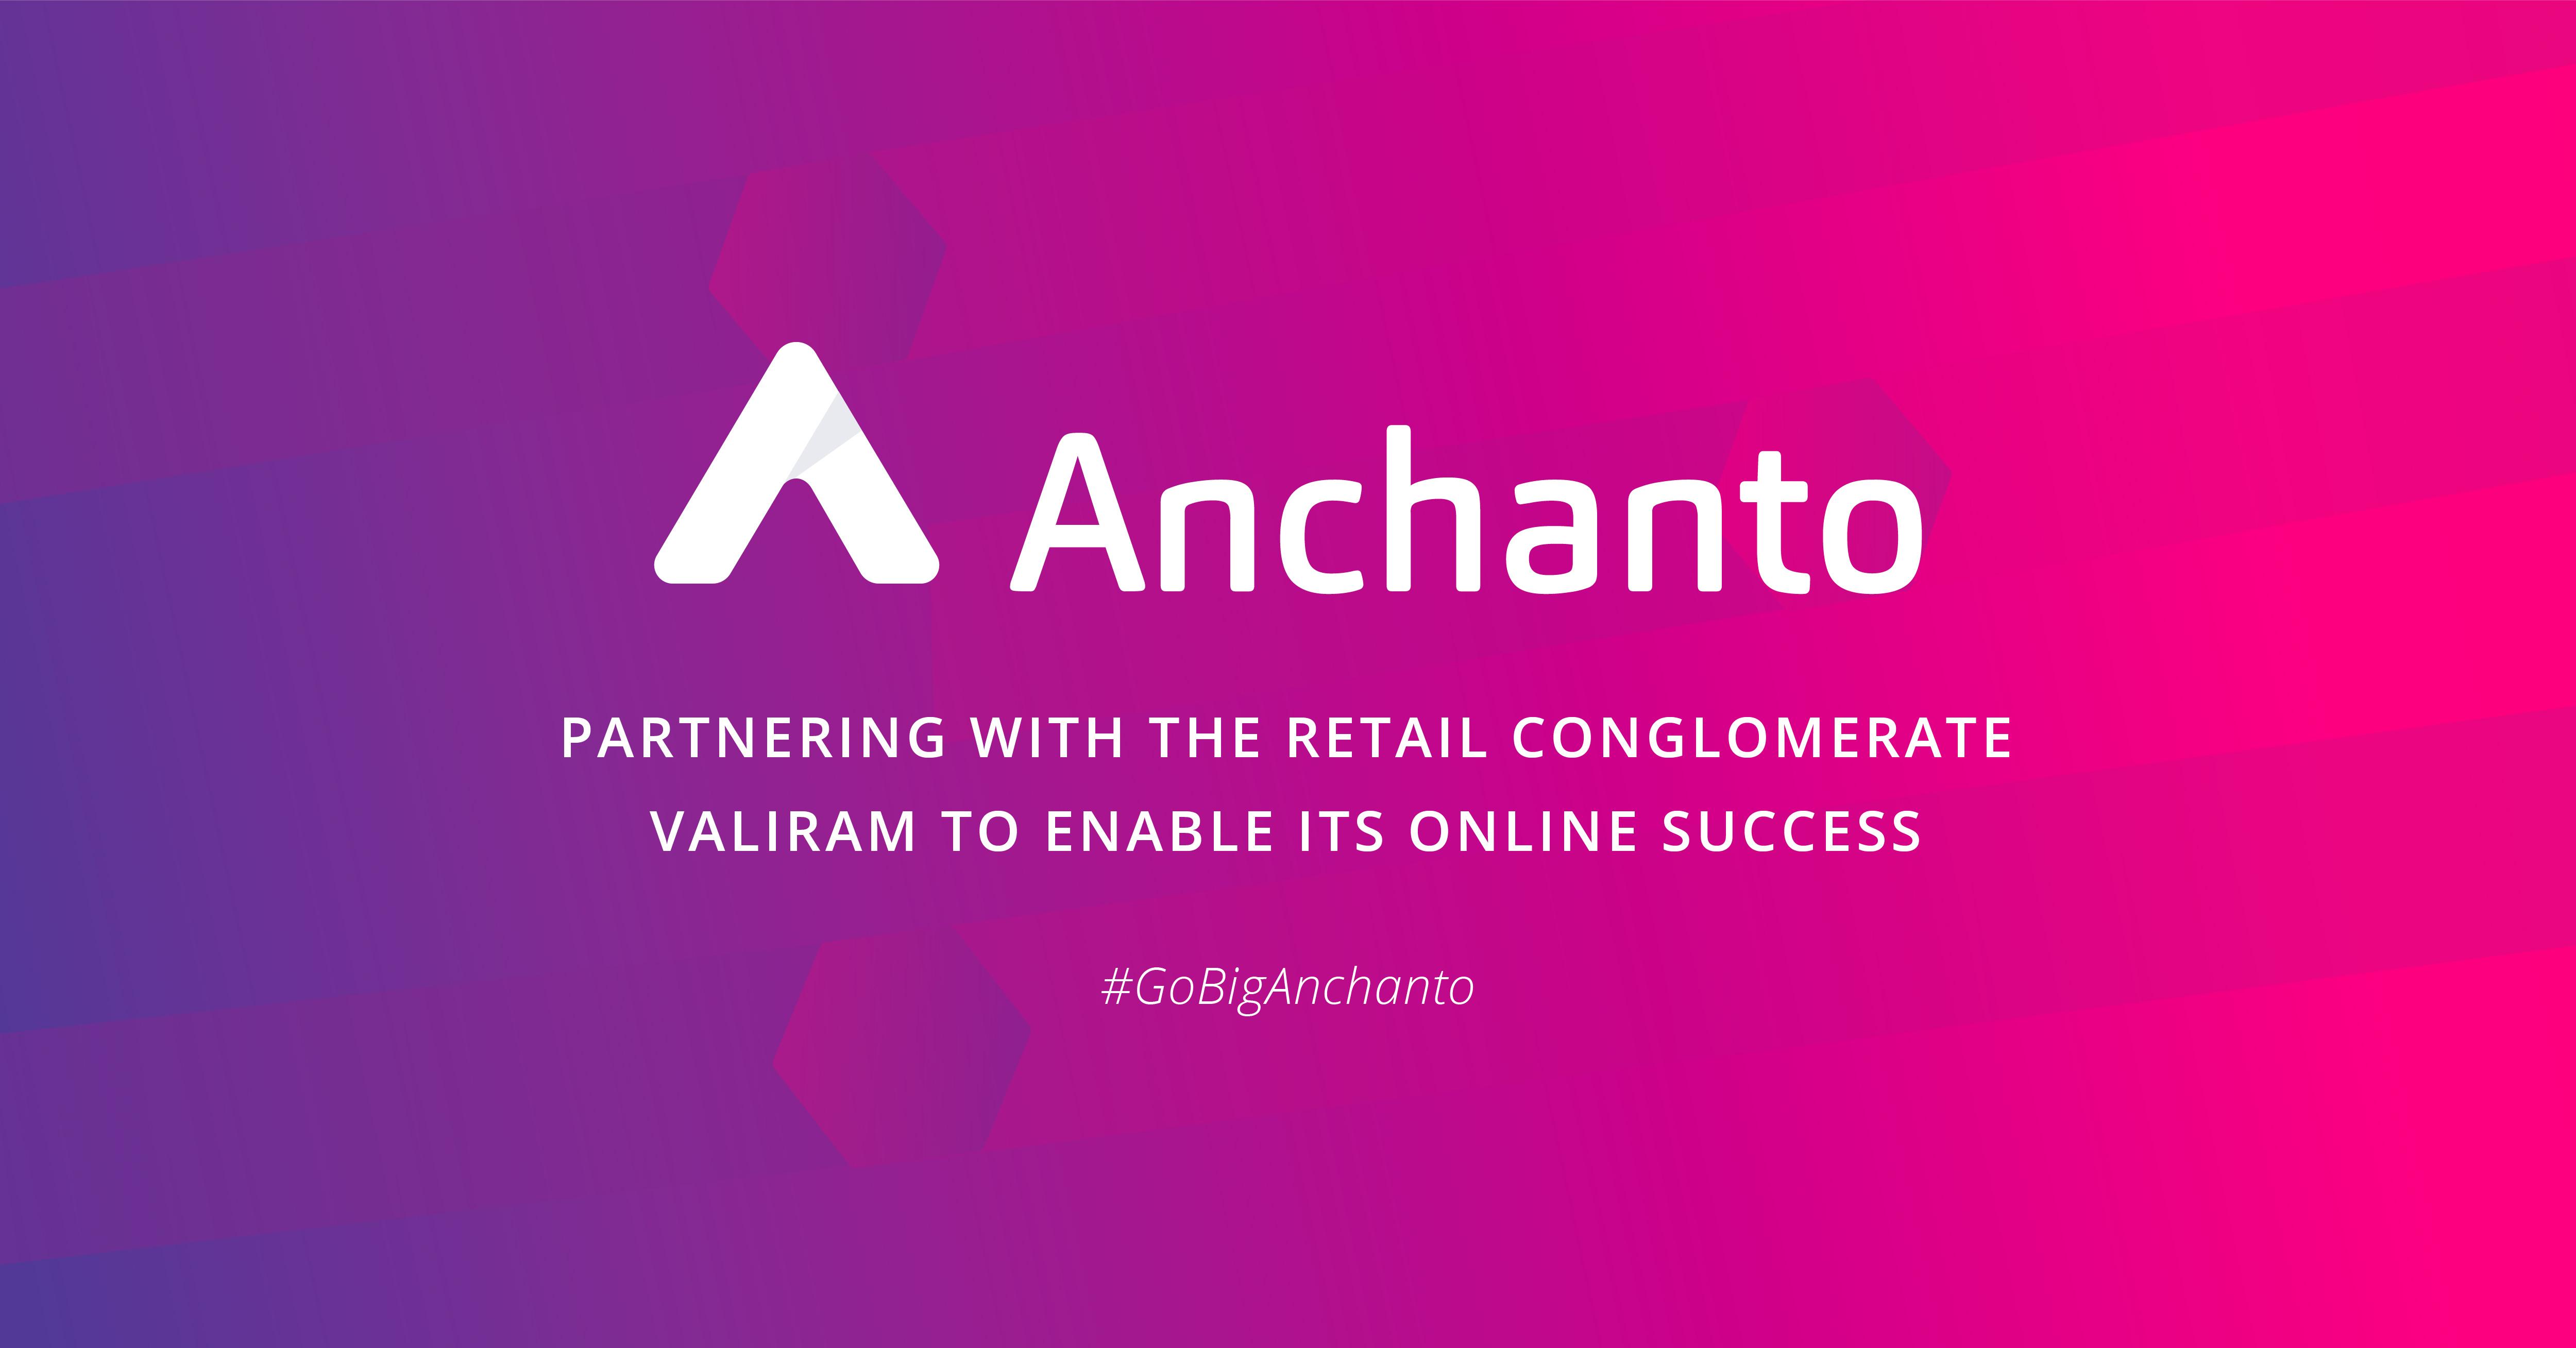 Valiram partners with Anchanto